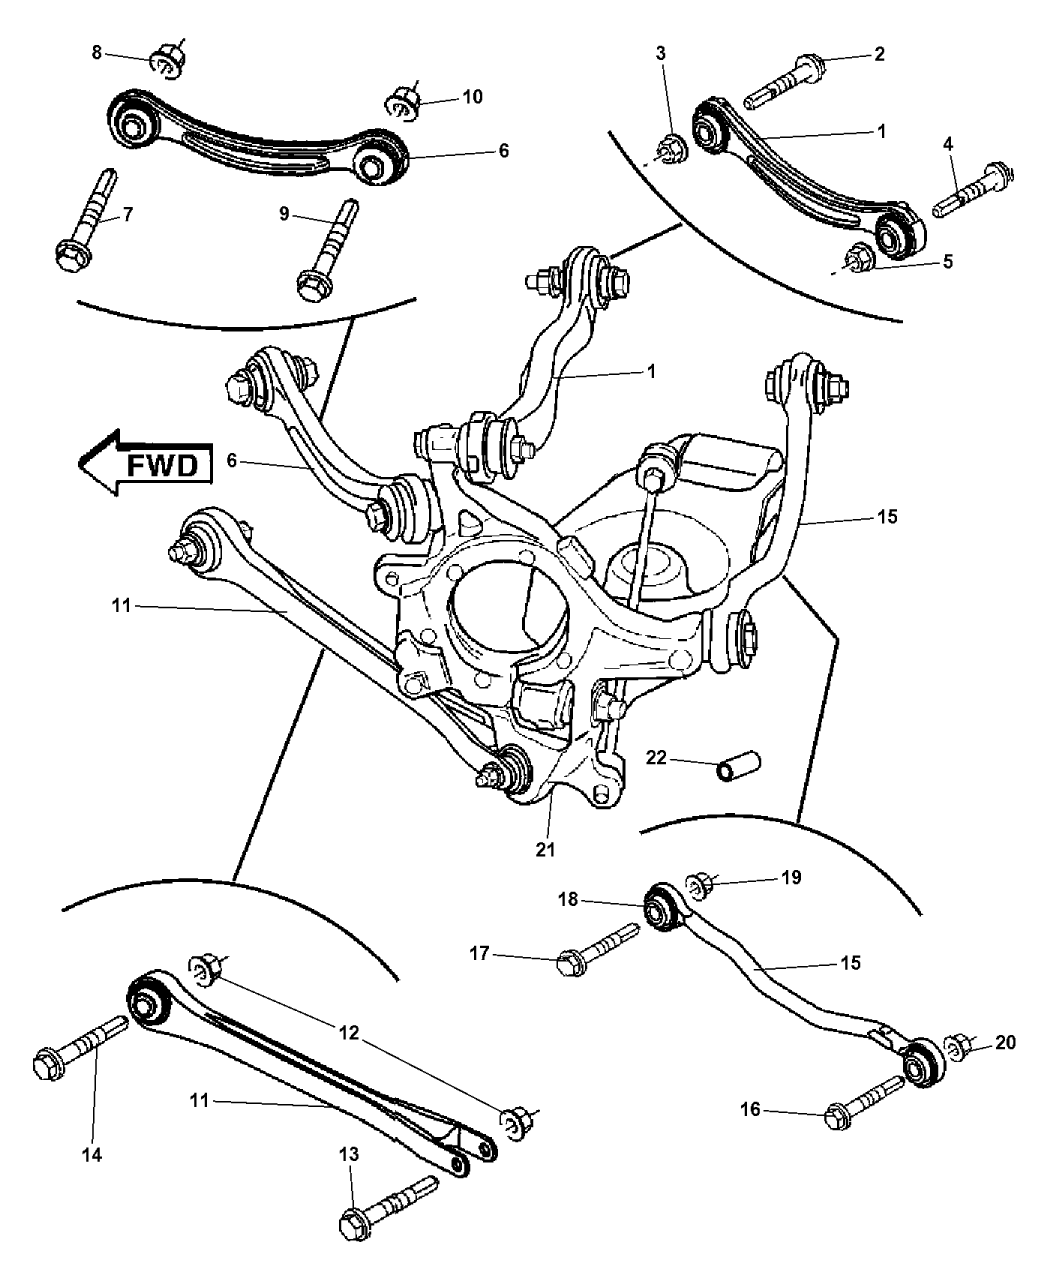 2006 Chrysler 300 3 7 Suspension Diagram